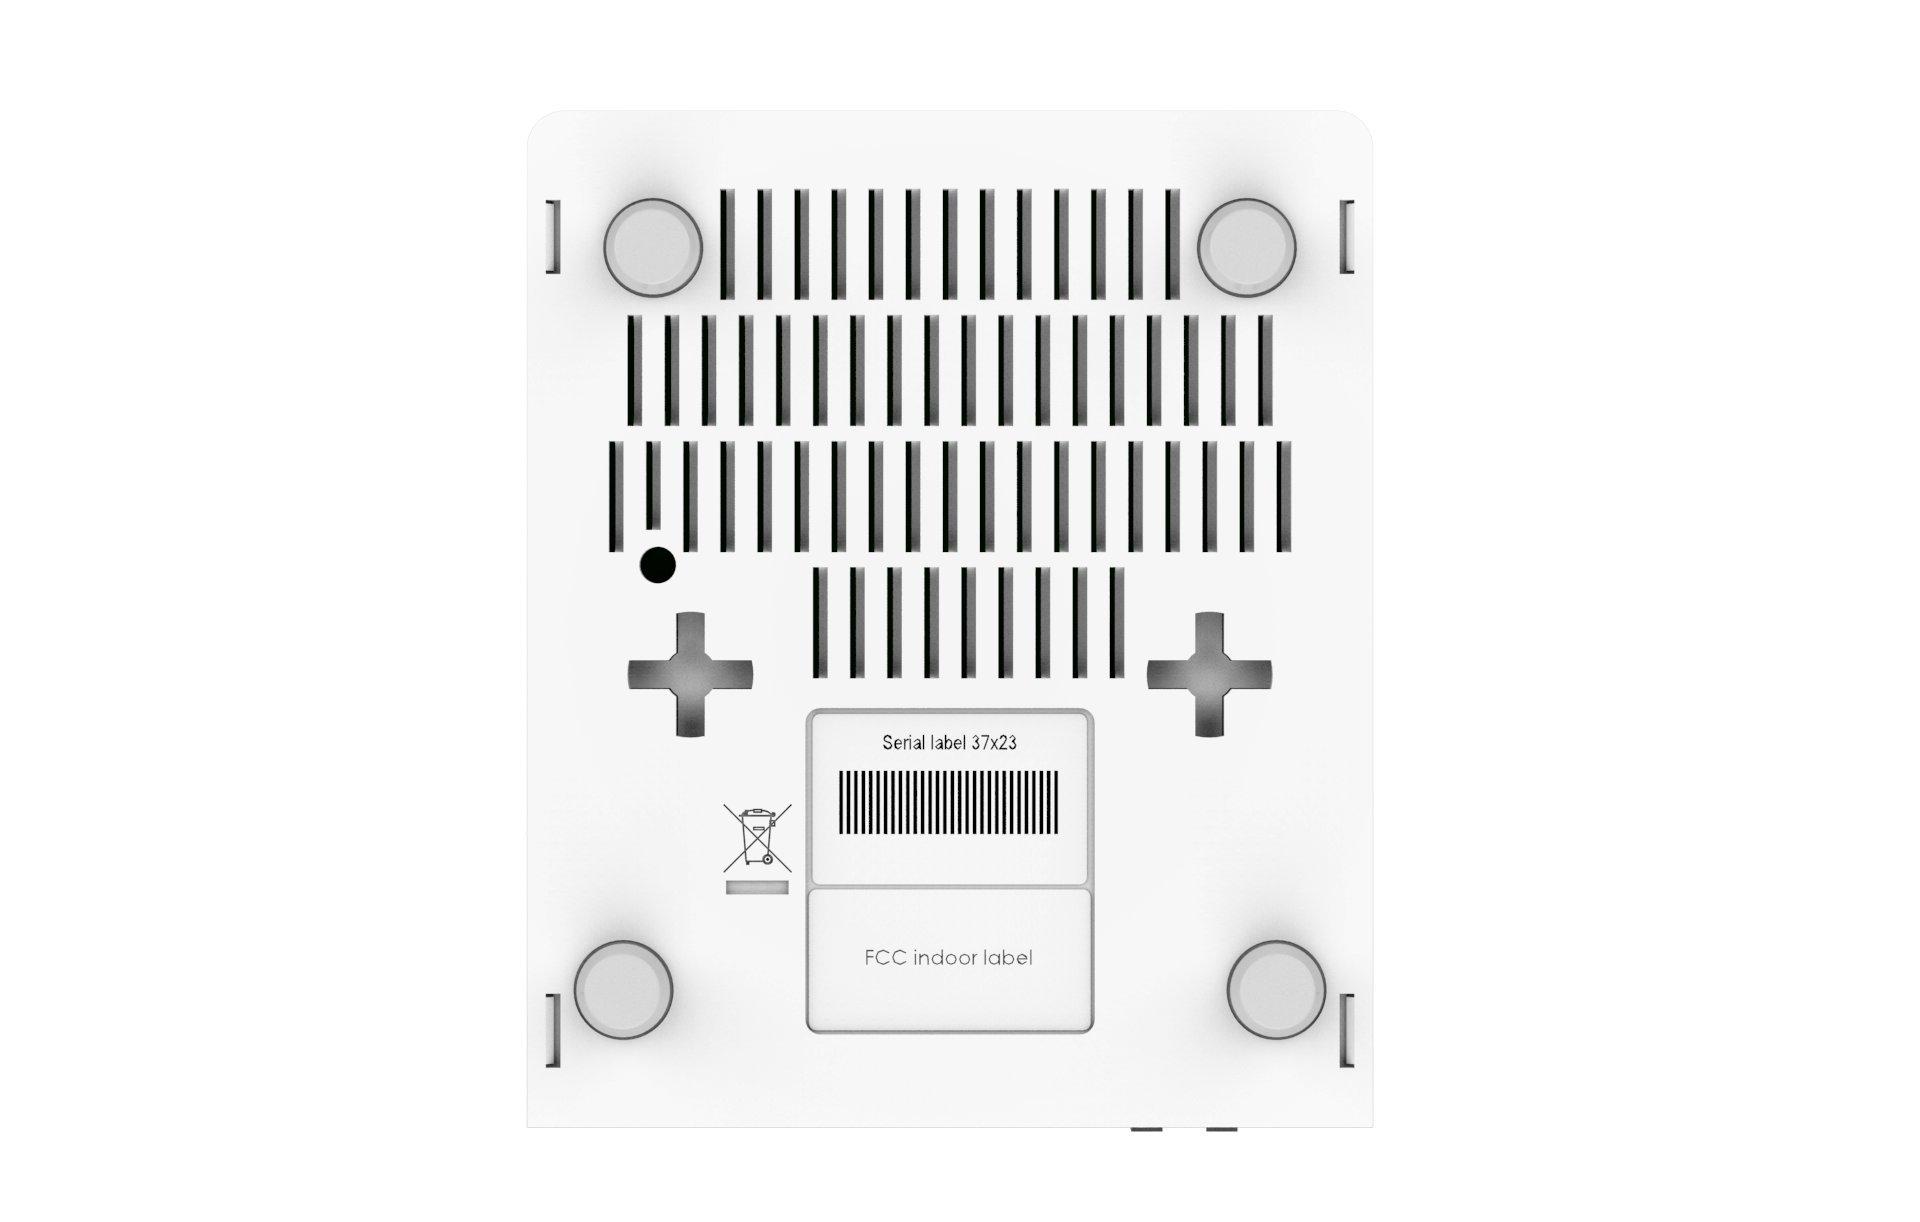 MikroTik Routerboard hEX PoE RB960PGS 5 Port Gigabit Ethernet Router